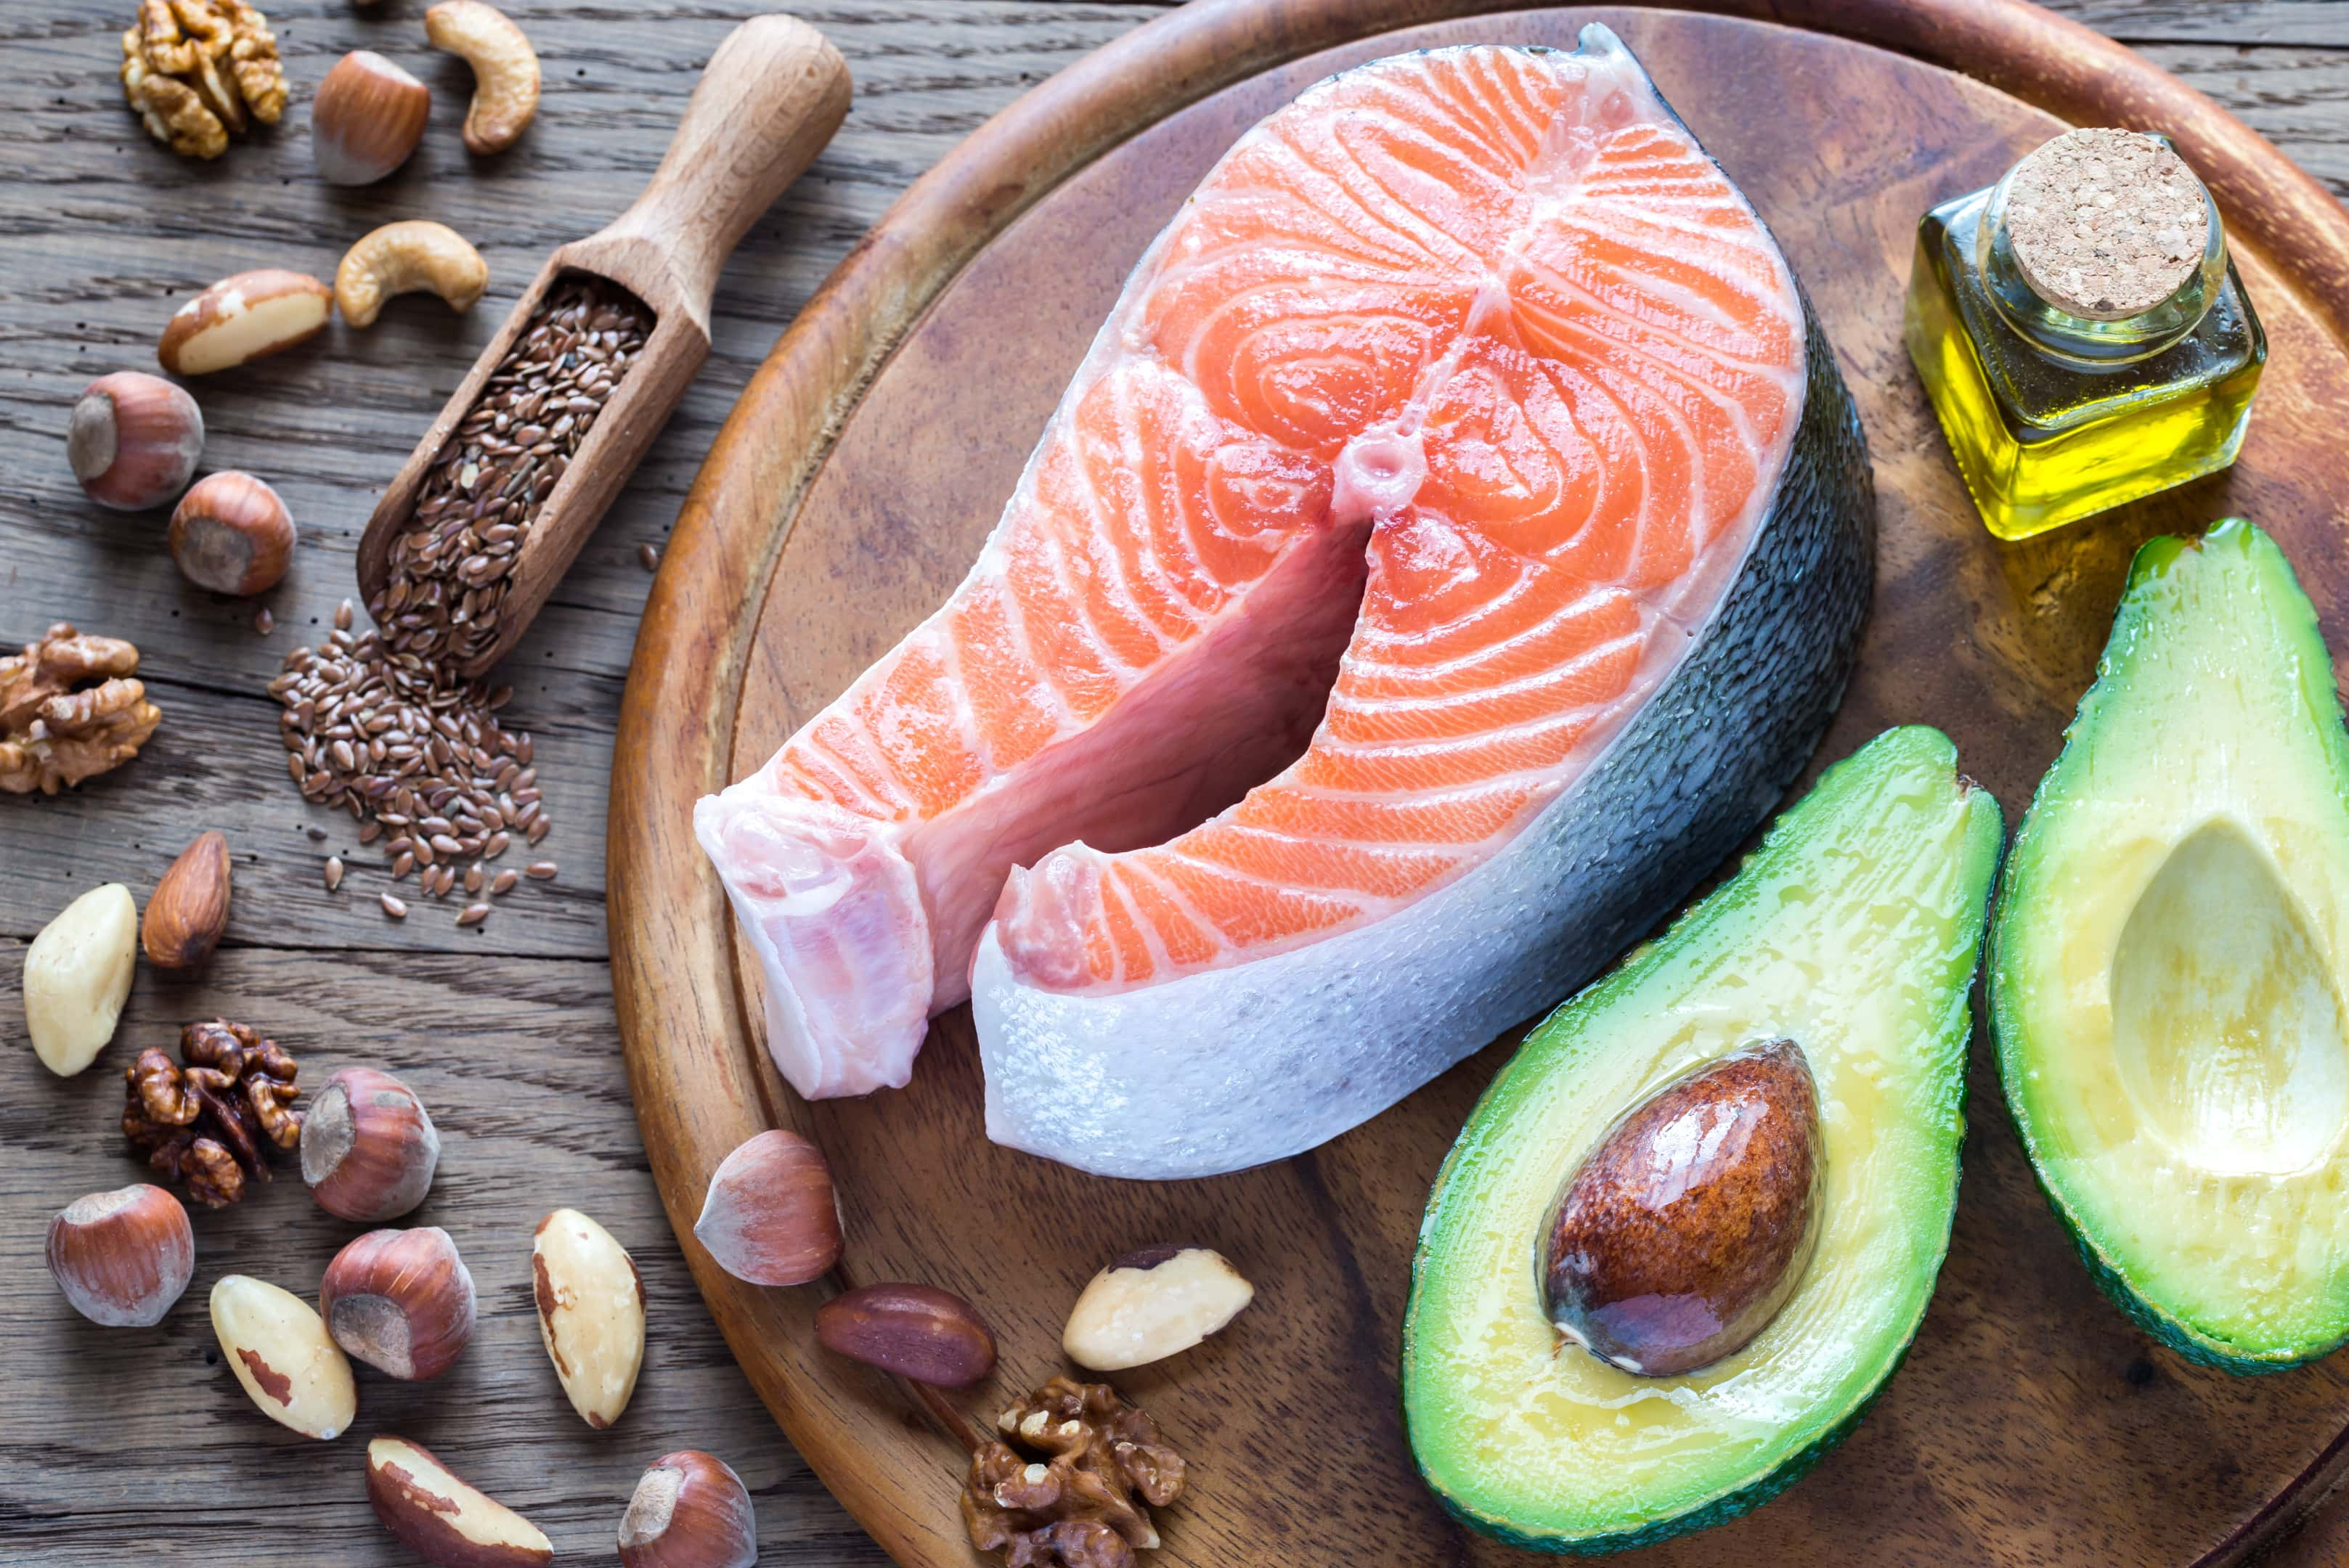 Salmon avocado and flex foods high omega-3 fats